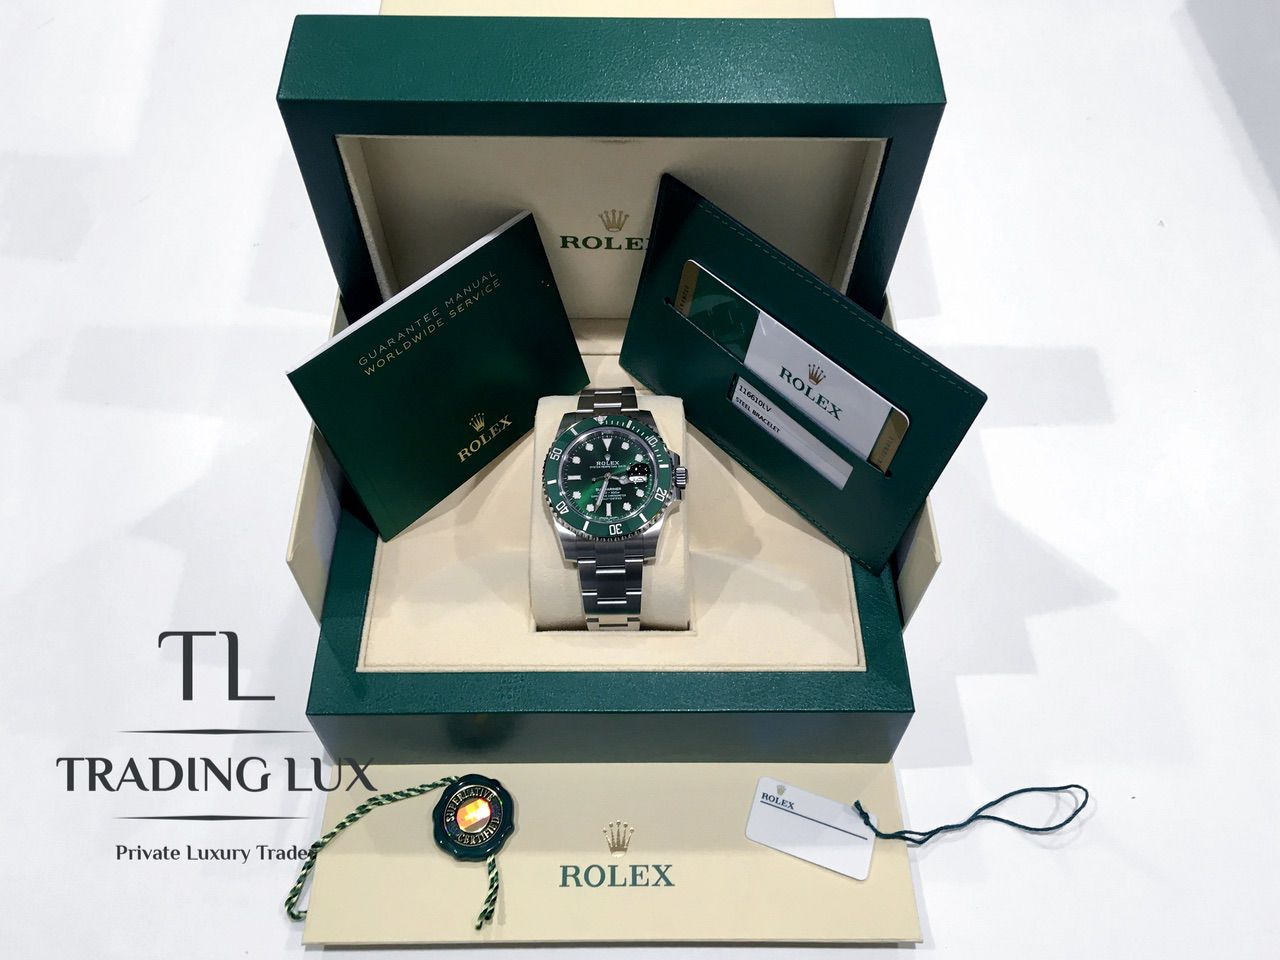 Rolex-116610LV-Hulk-7